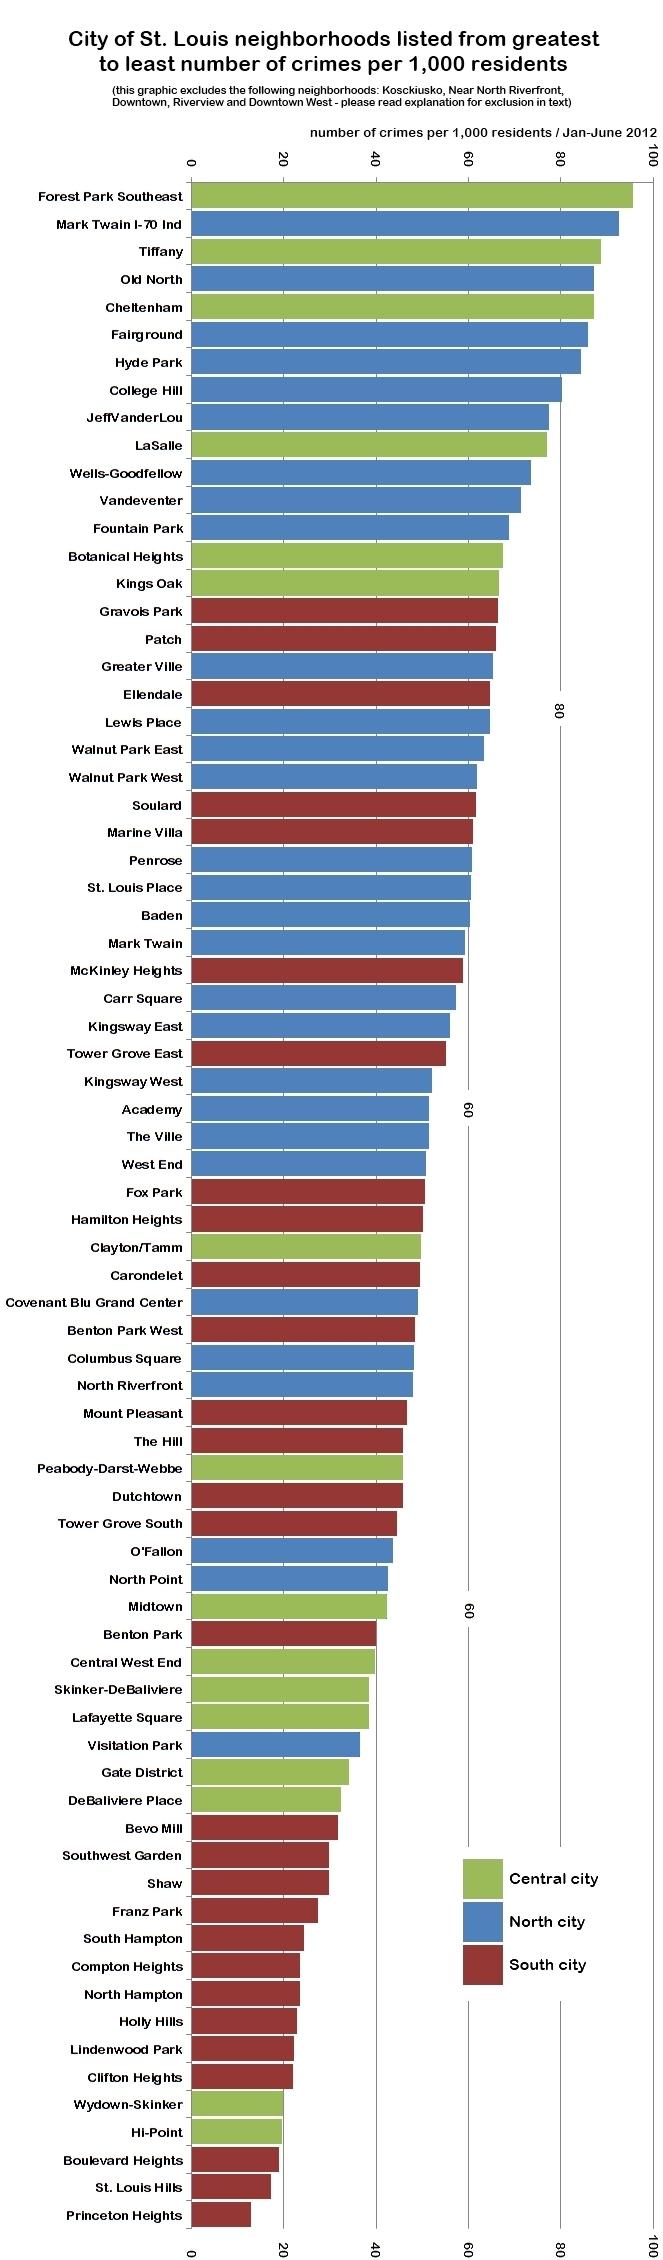 Understanding St. Louis: Total Crime Index, Violent Crimes and Property Crimes in City Neighborhoods